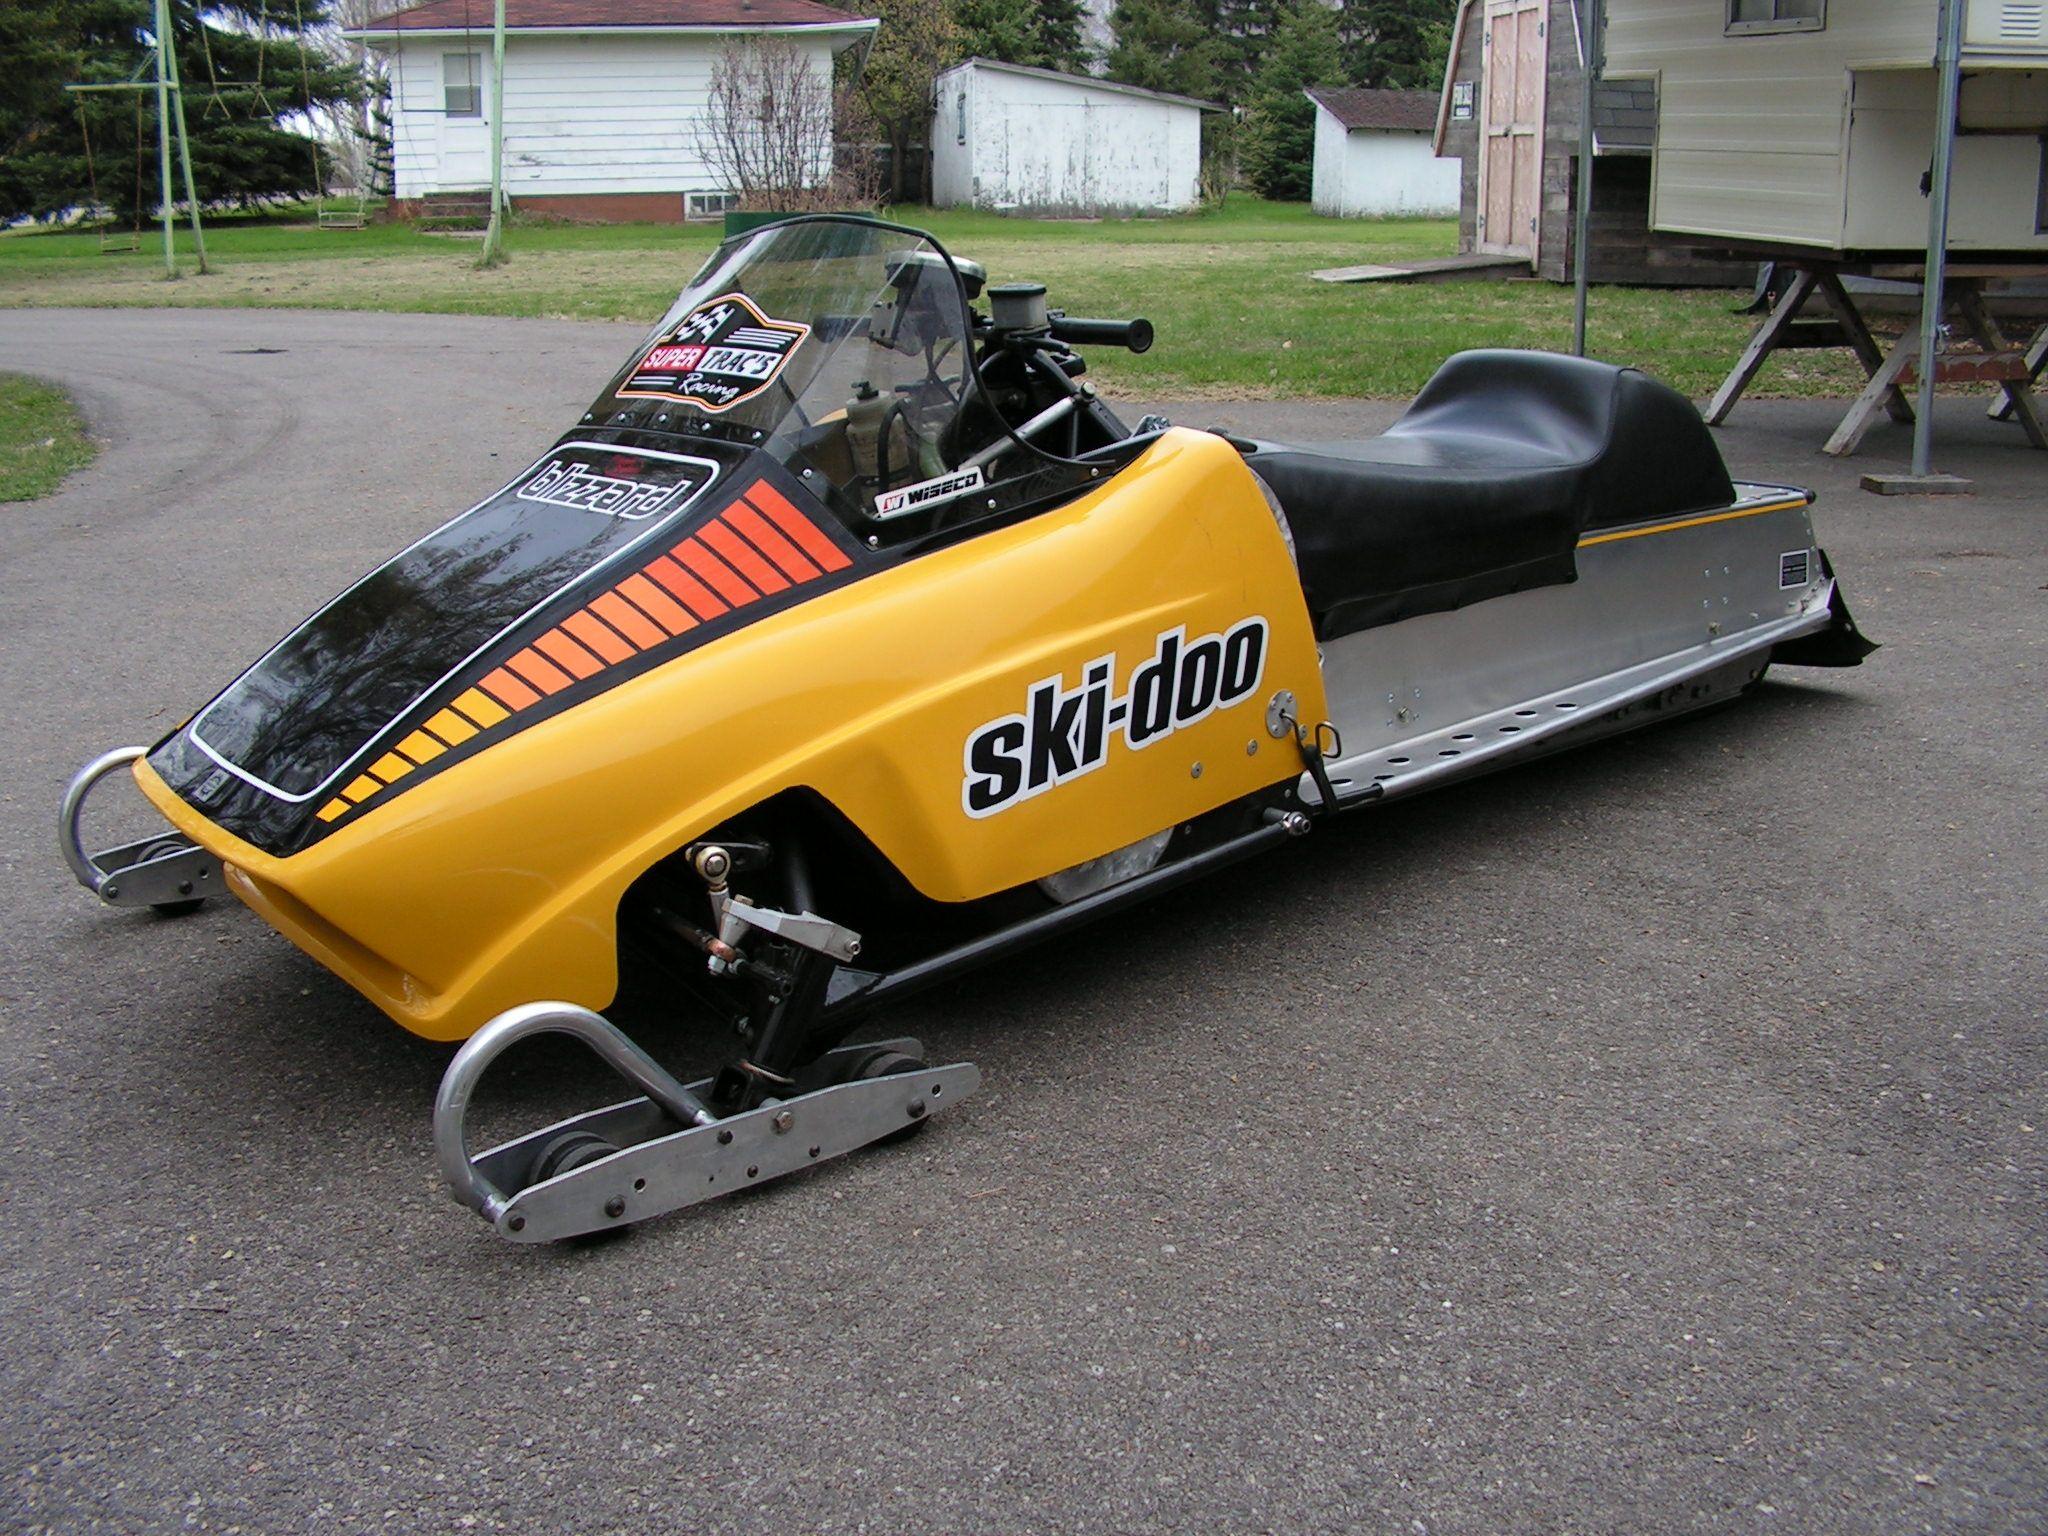 1978 Ski Doo Ss 500cc Snopro Clone Asphalt Racer Sleds